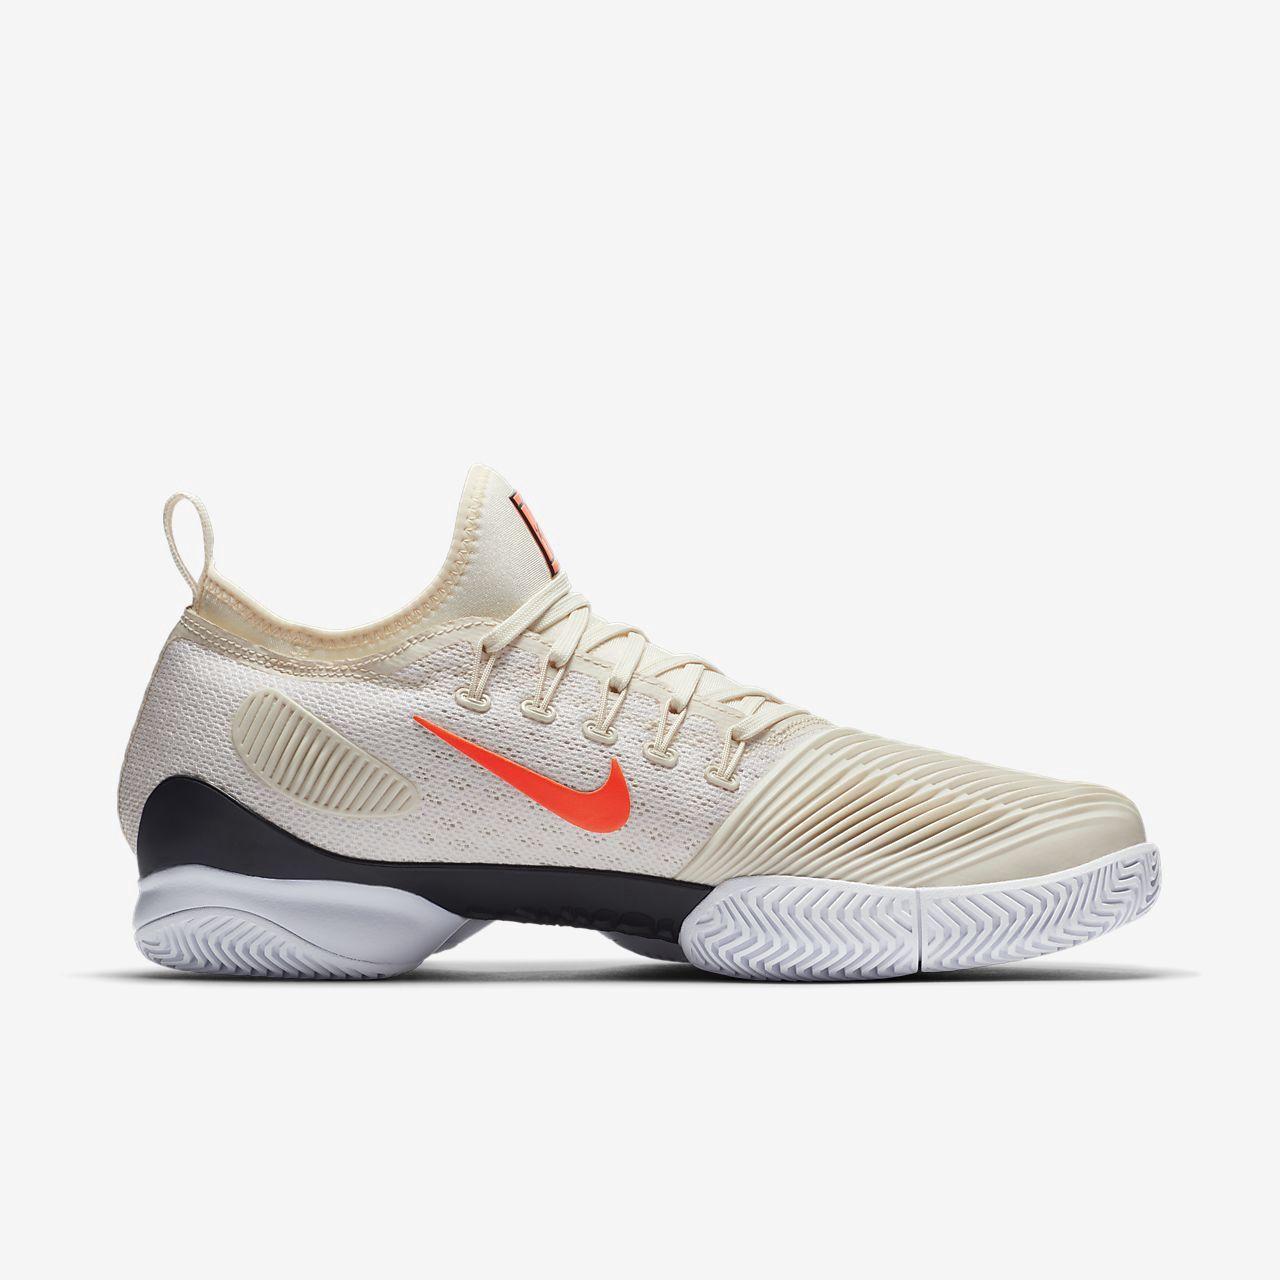 cheaper 71584 e4b97 Nike Court Air Zoom Ultra Rct Men's Tennis Shoe - 12.5 | Shoes ...